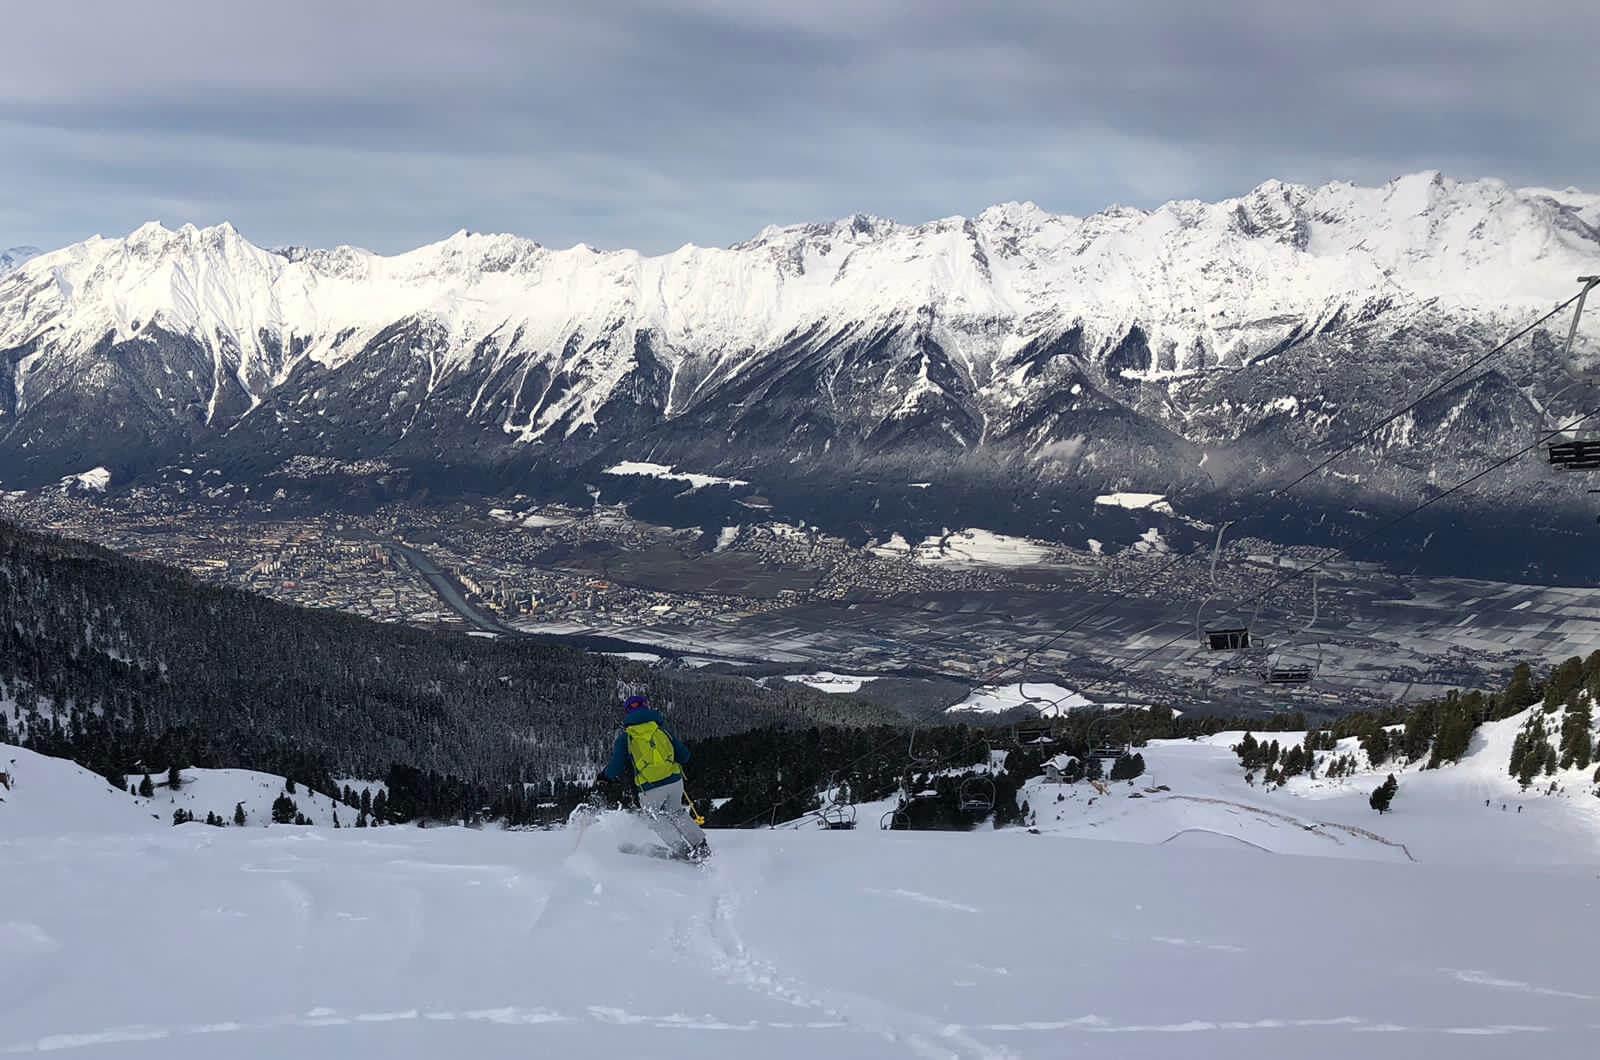 Fachchoaching Destinationsmarekting I alpinonline